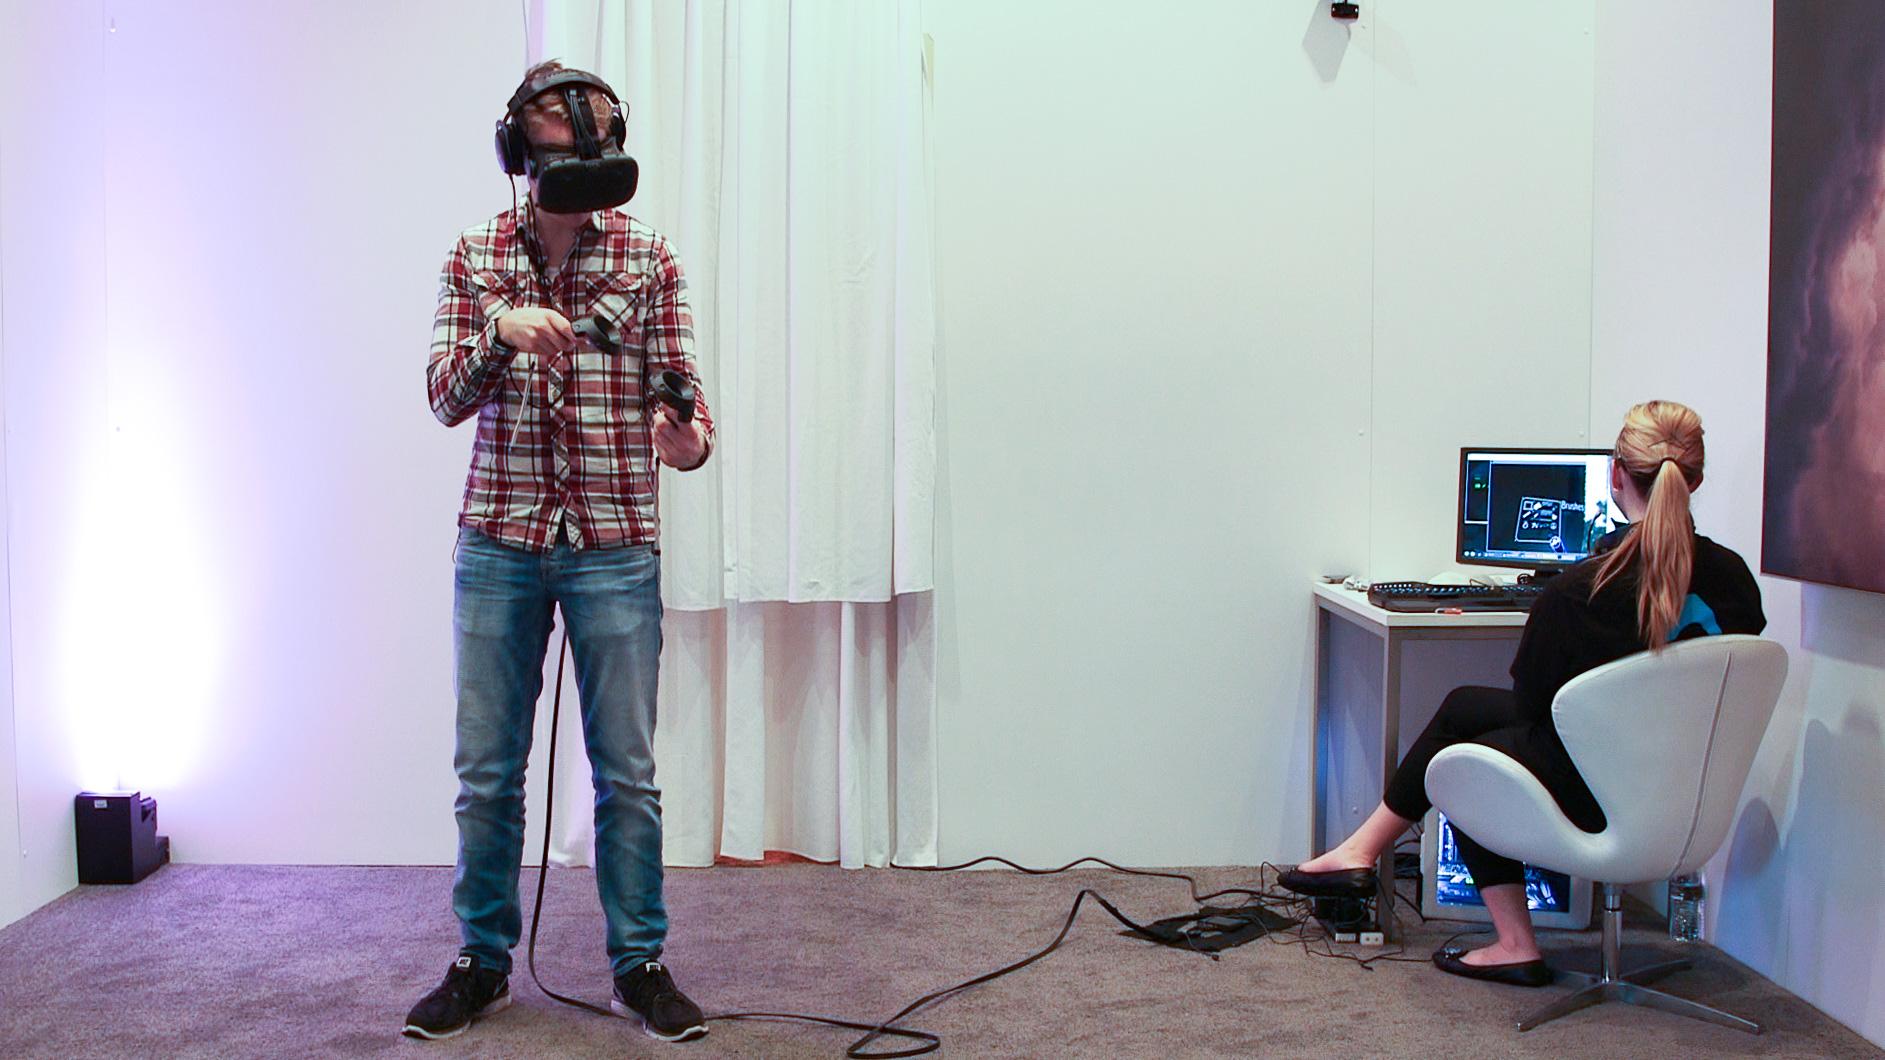 HTC Vive en Oculus Rift op de CES - Tot slot - Preview - Tweakers